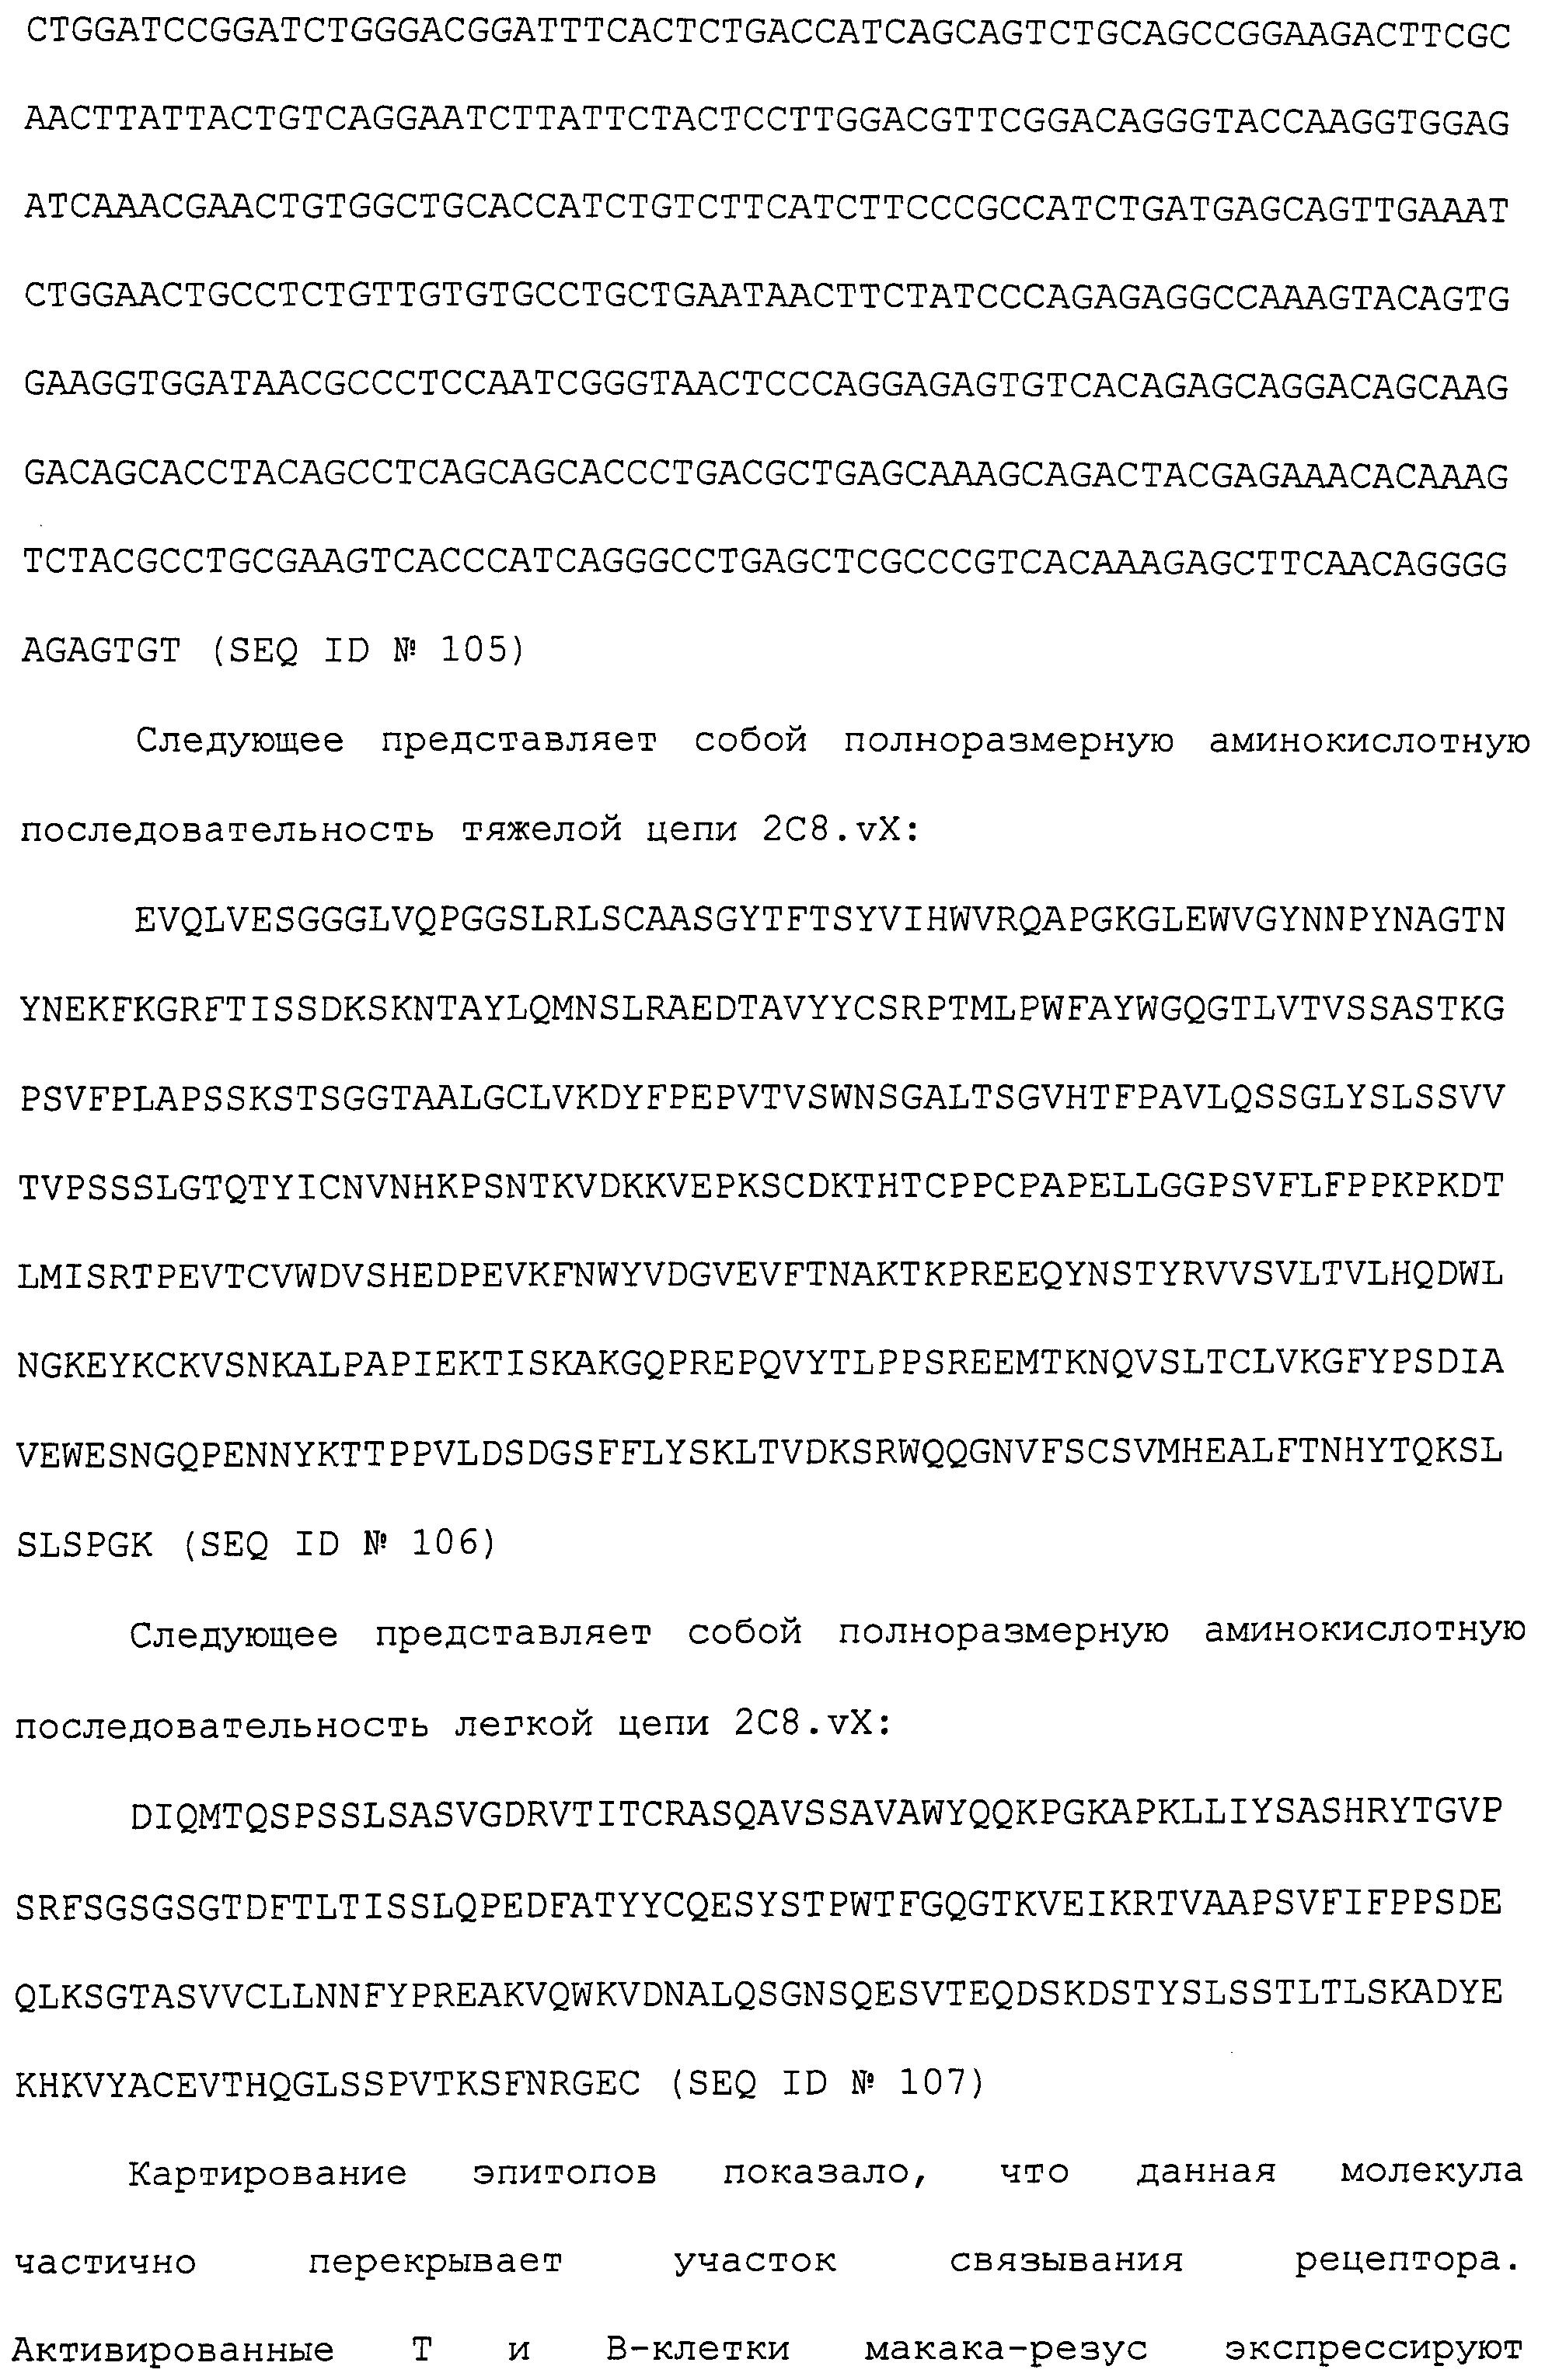 Figure 00000277